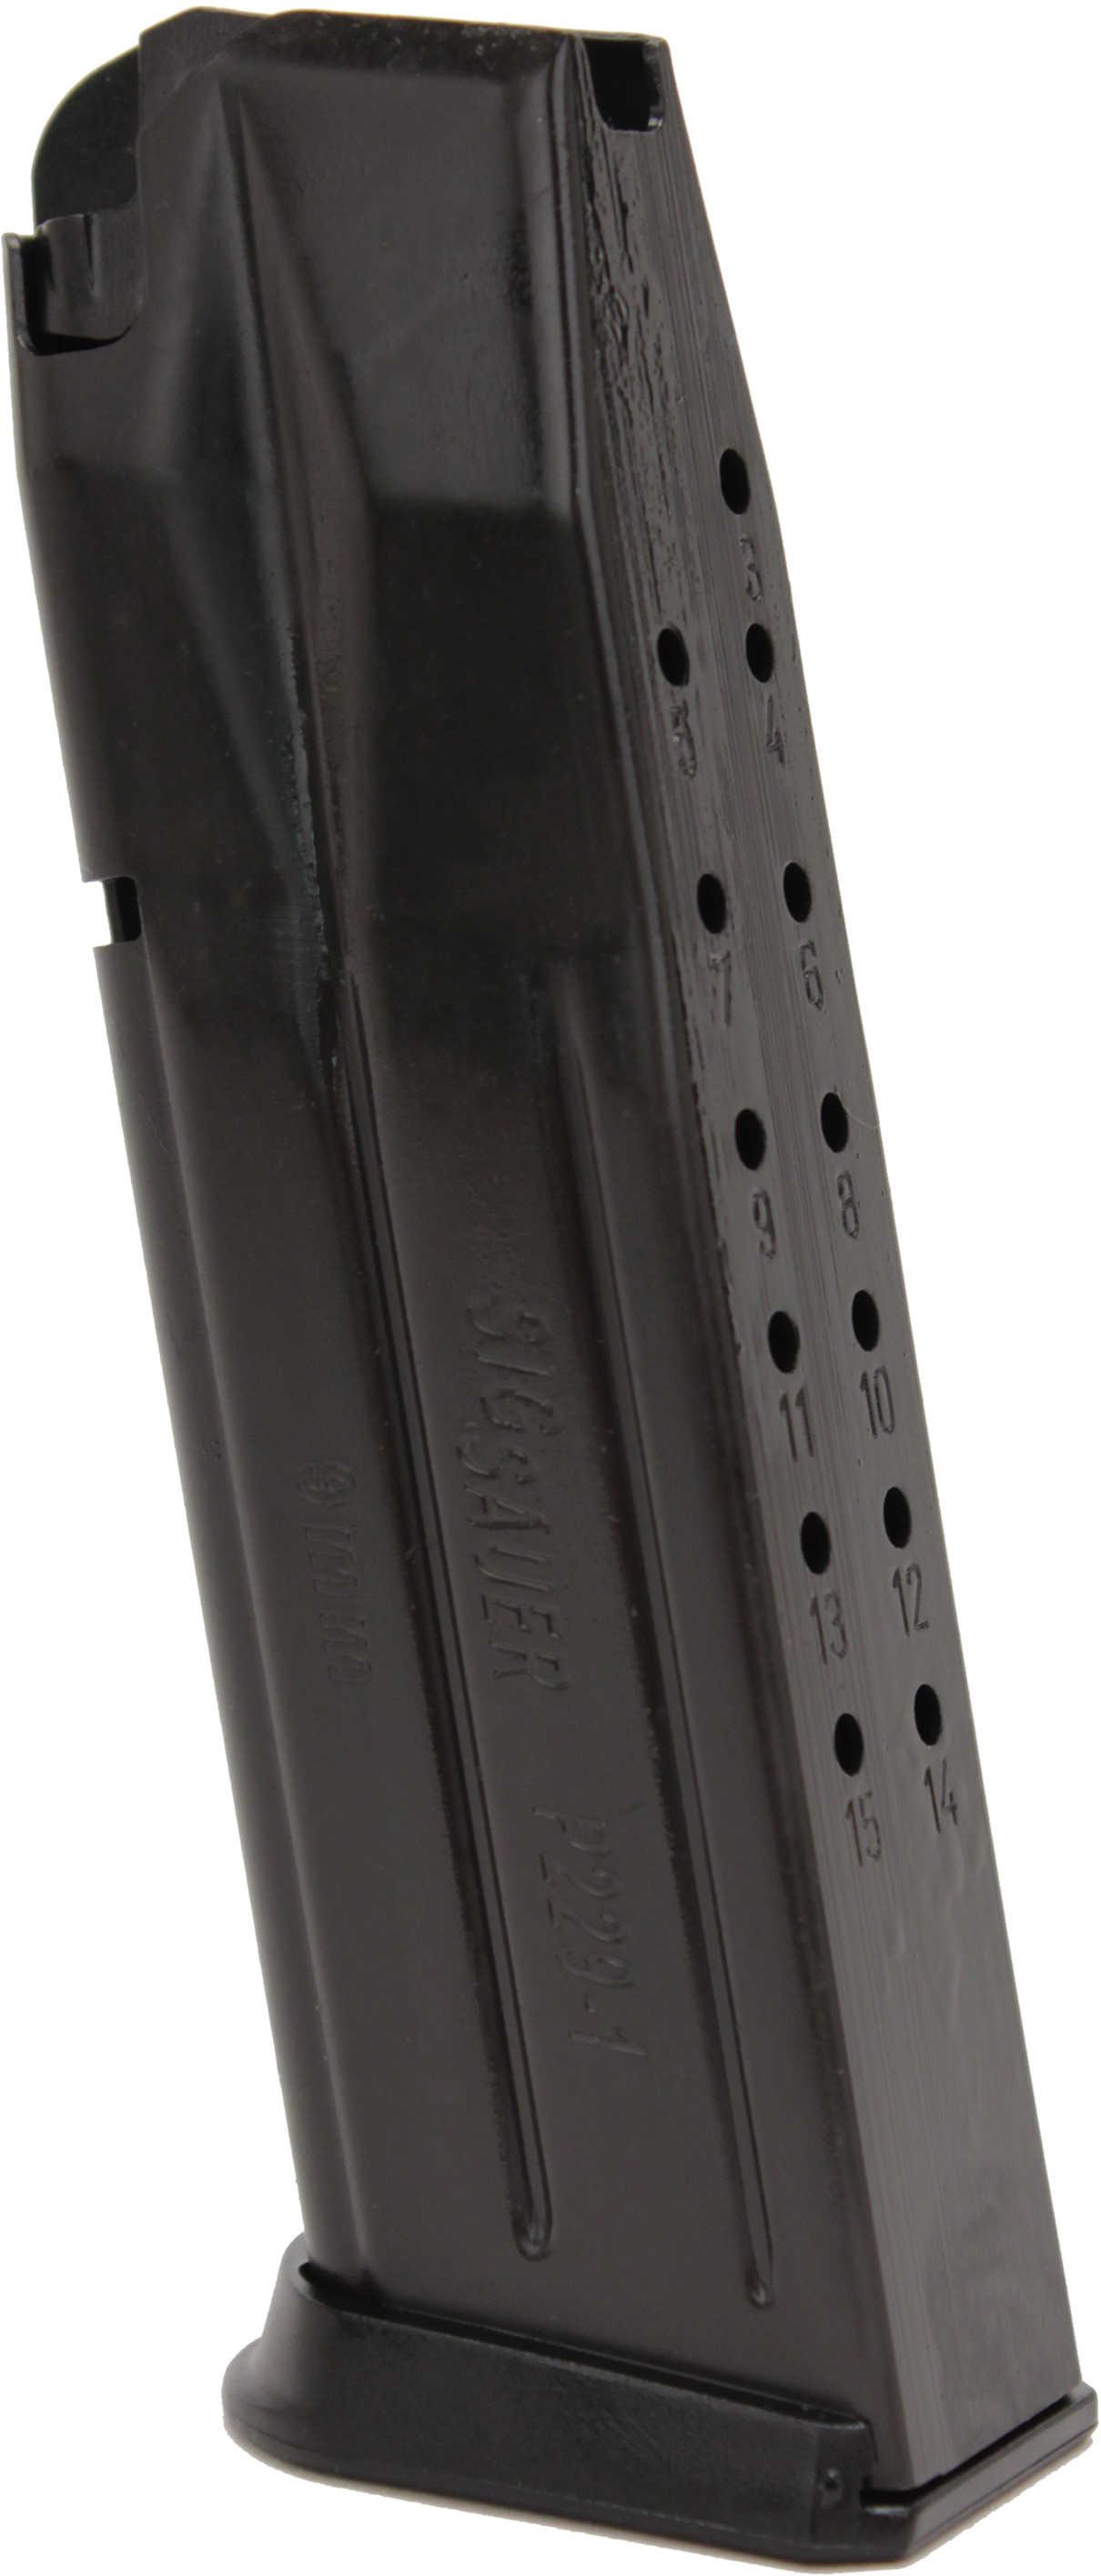 Sig Sauer Magazine P229 9mm 15Rd E2 & UPDATED P229 Models MAG229915E2